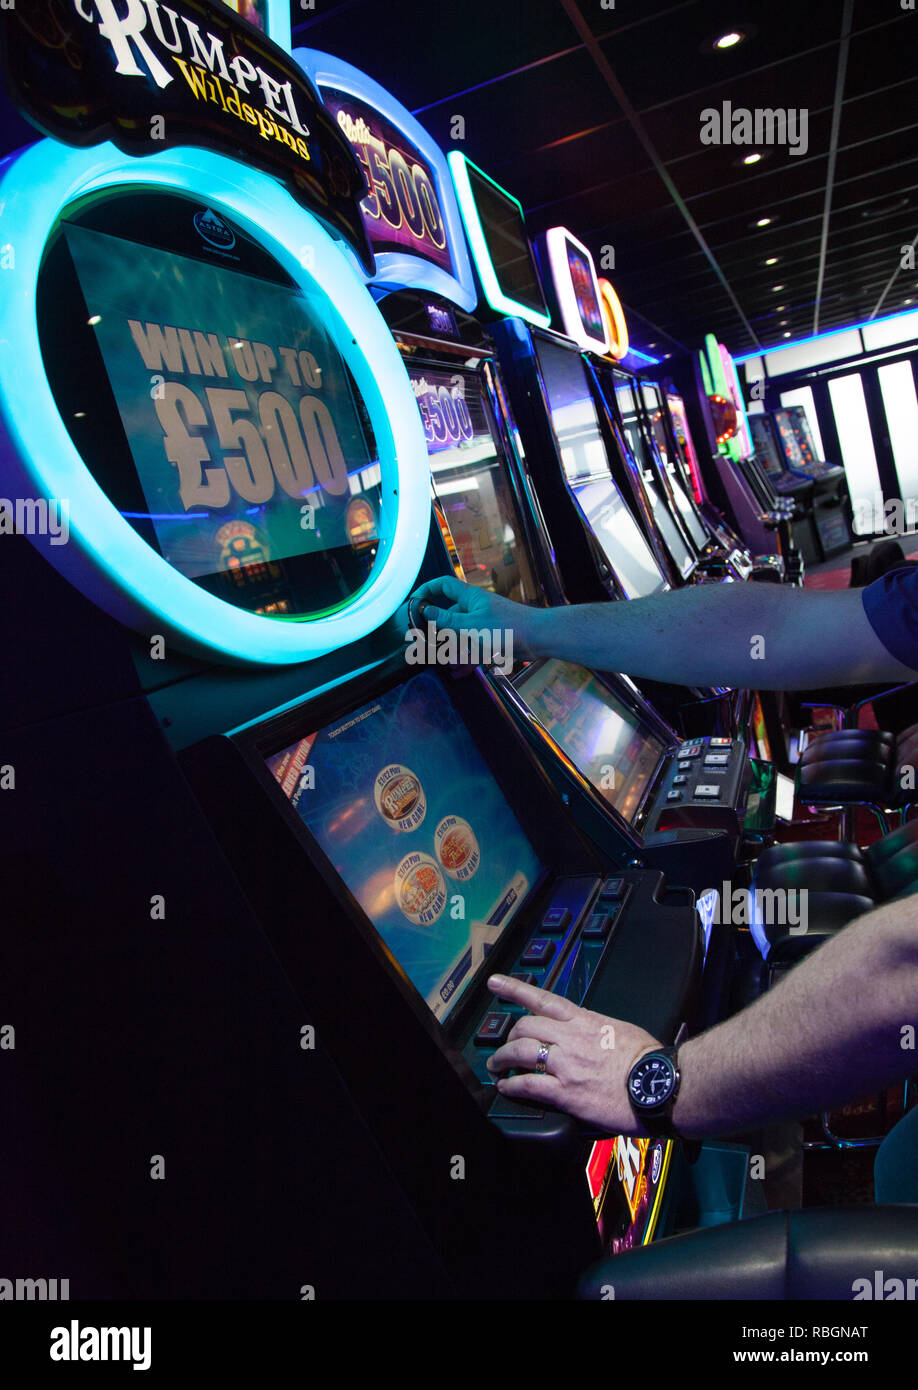 Spielautomaten simulation real moneyware